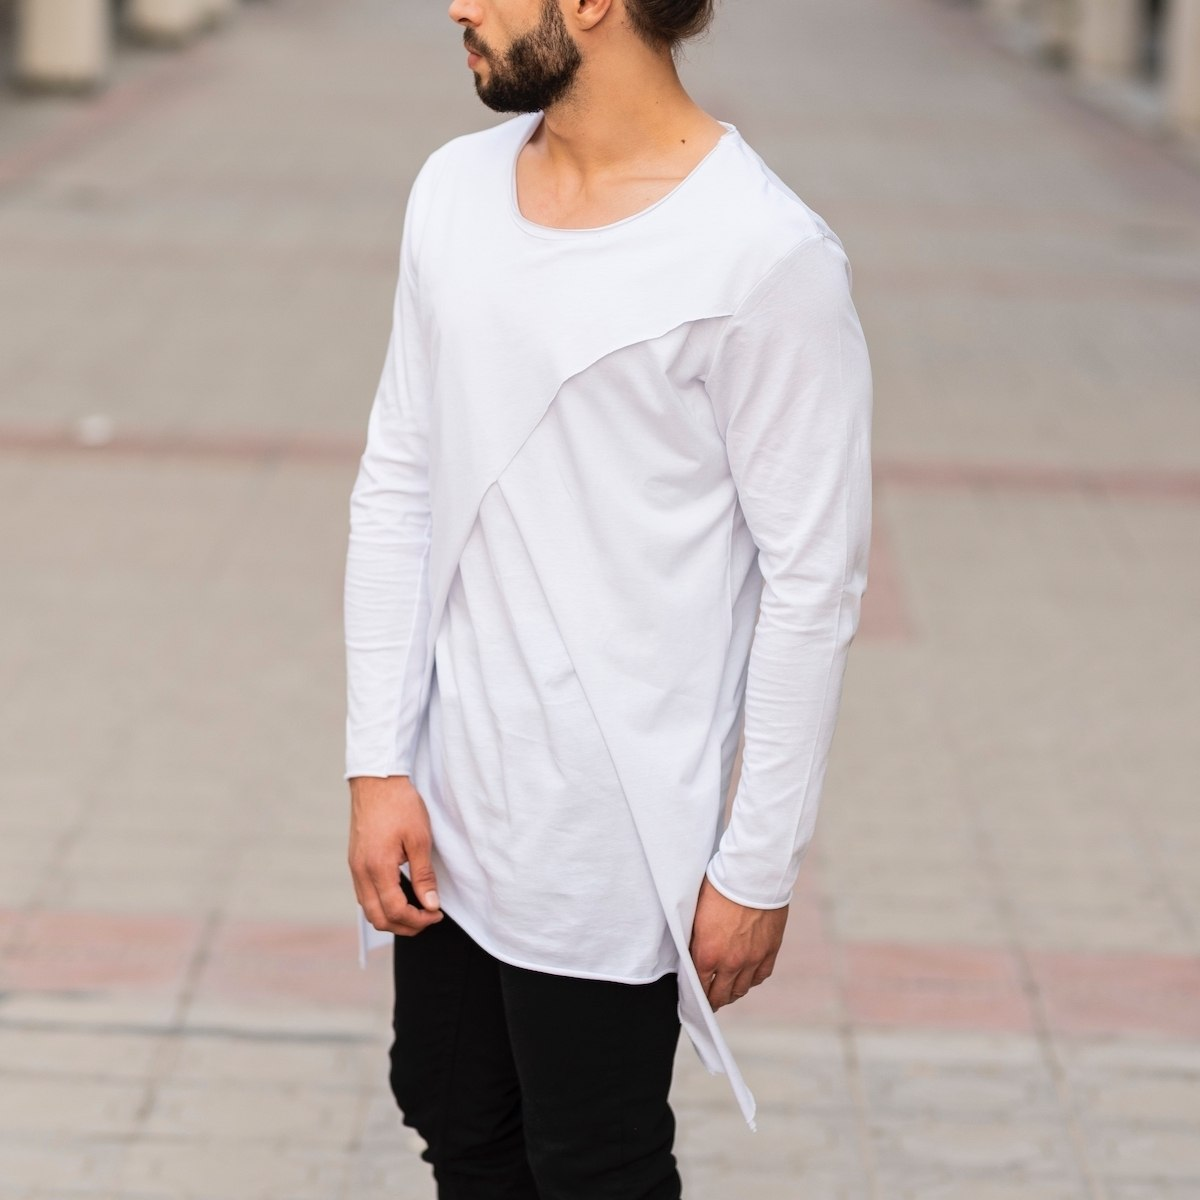 Double Textured Sweatshirt In White Mv Premium Brand - 3